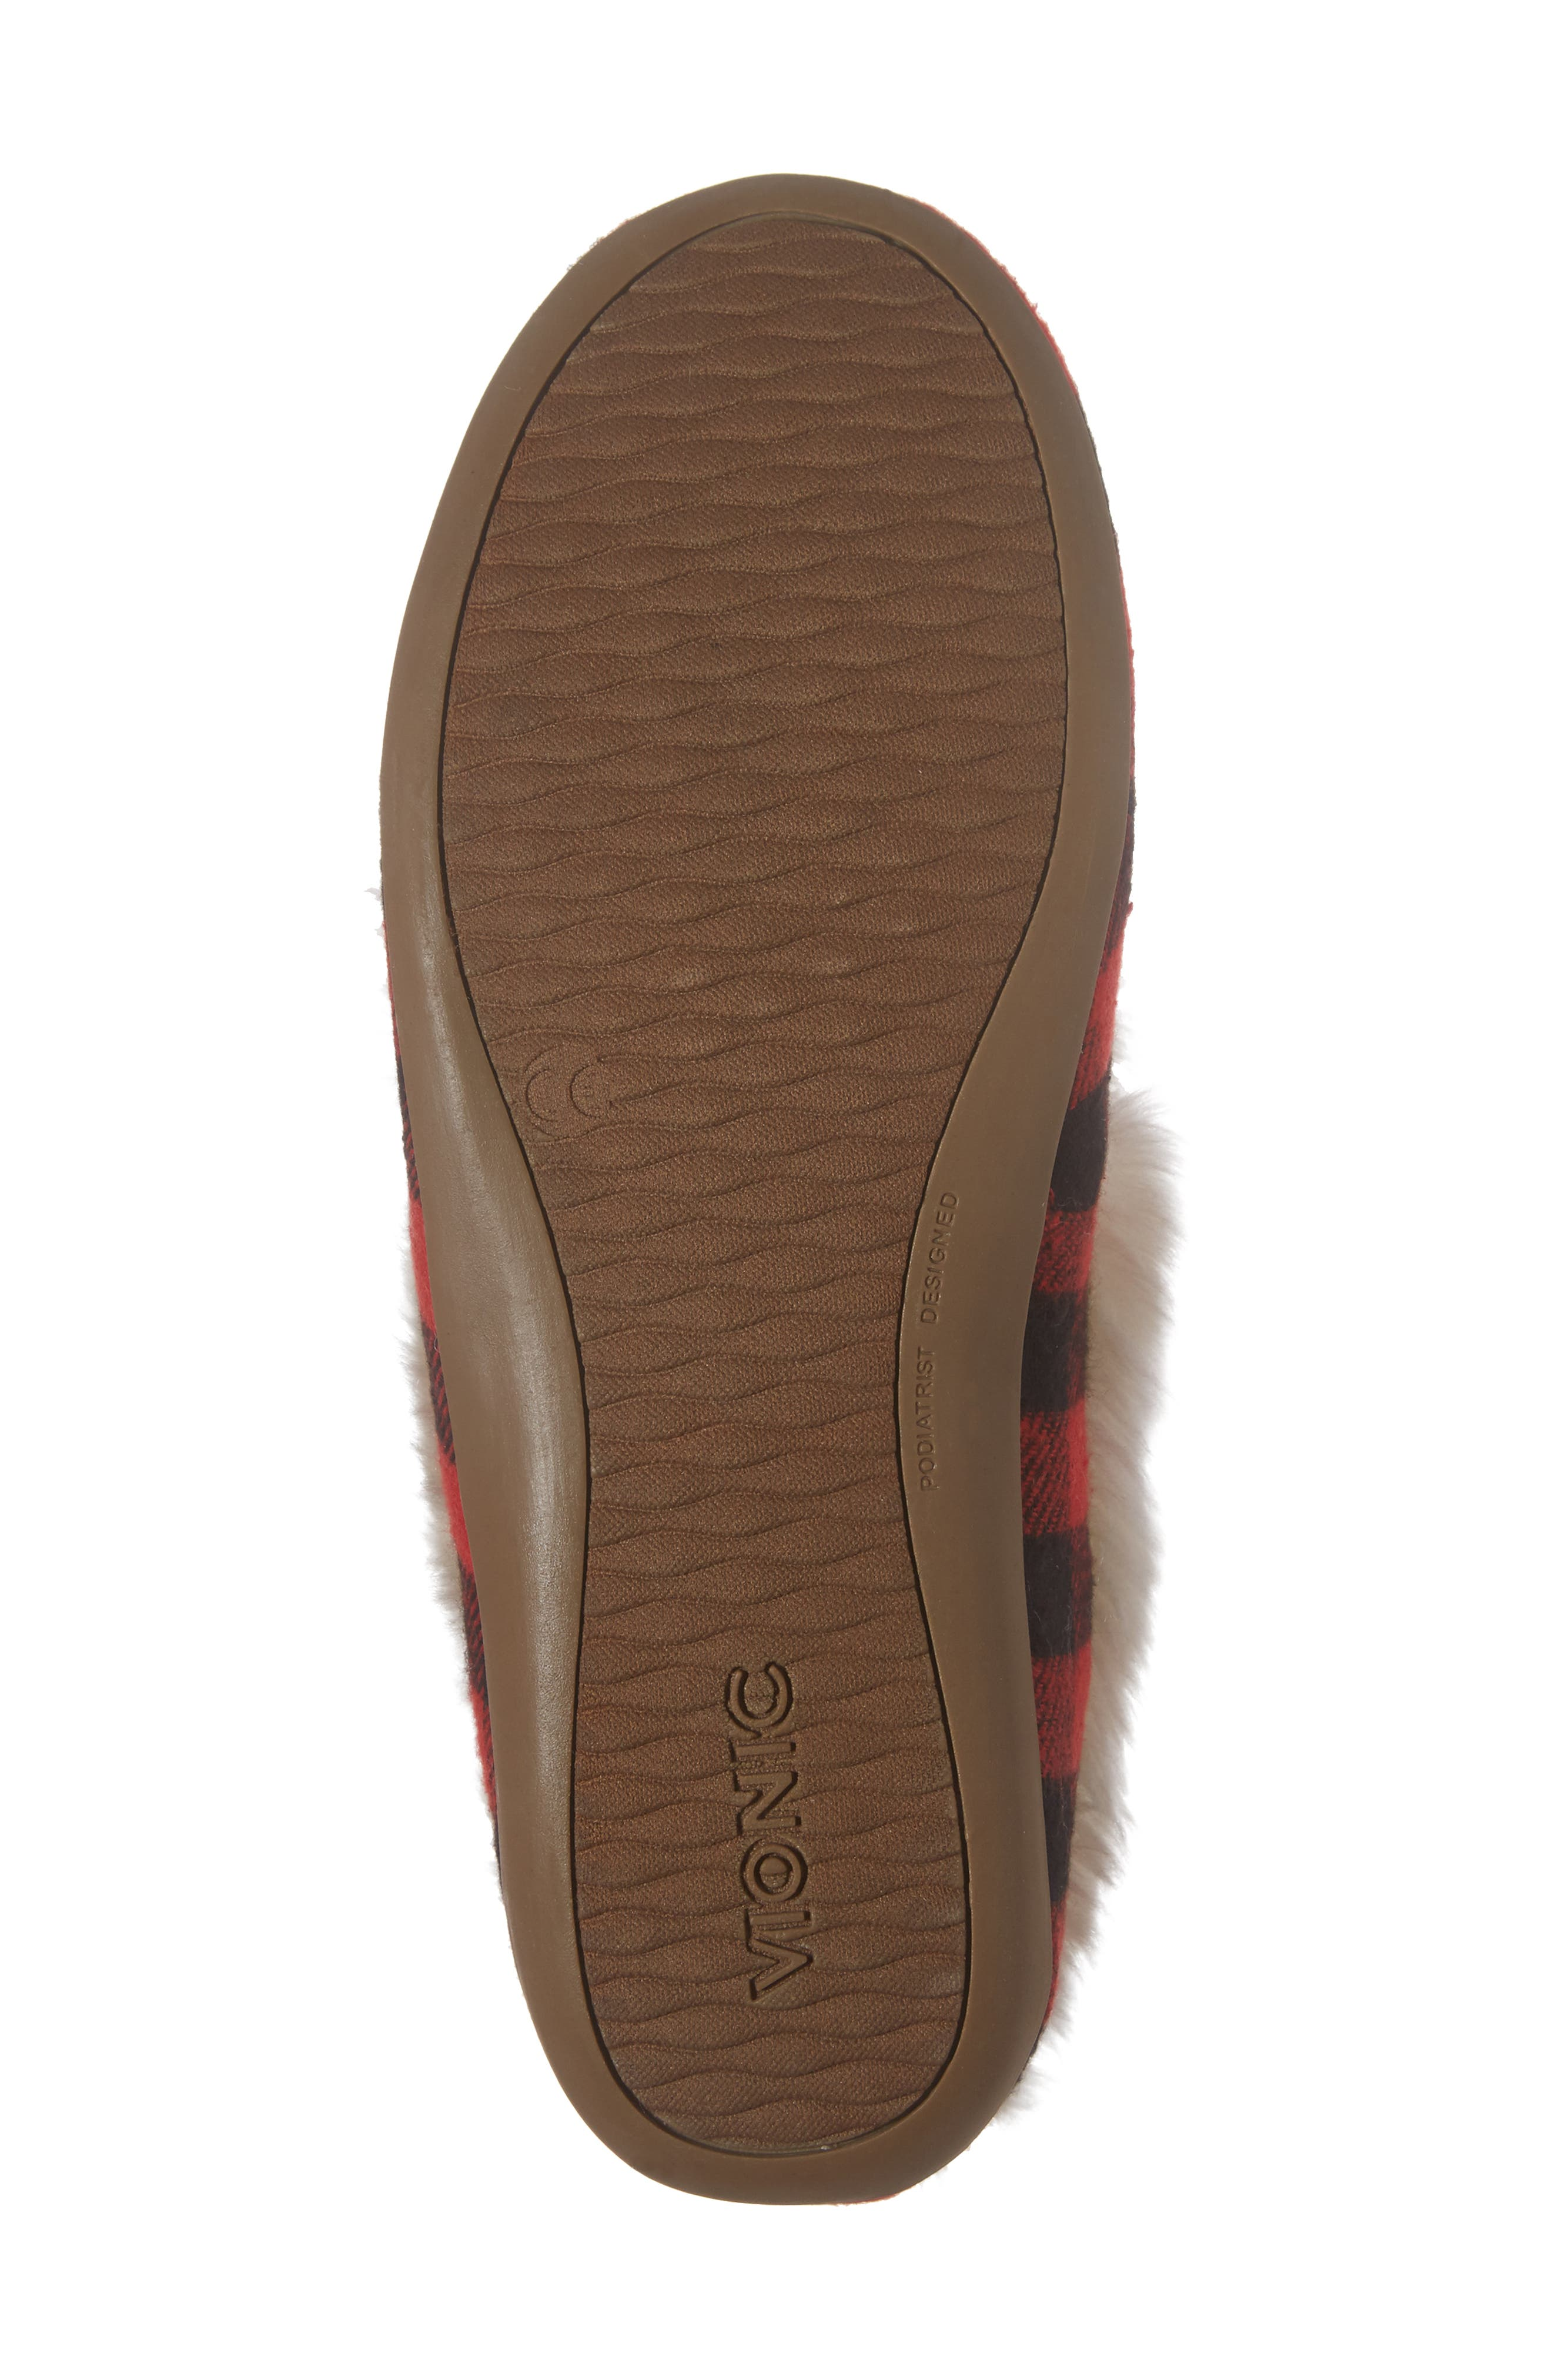 Juniper Faux Fur Slipper,                             Alternate thumbnail 6, color,                             Black Red Textile